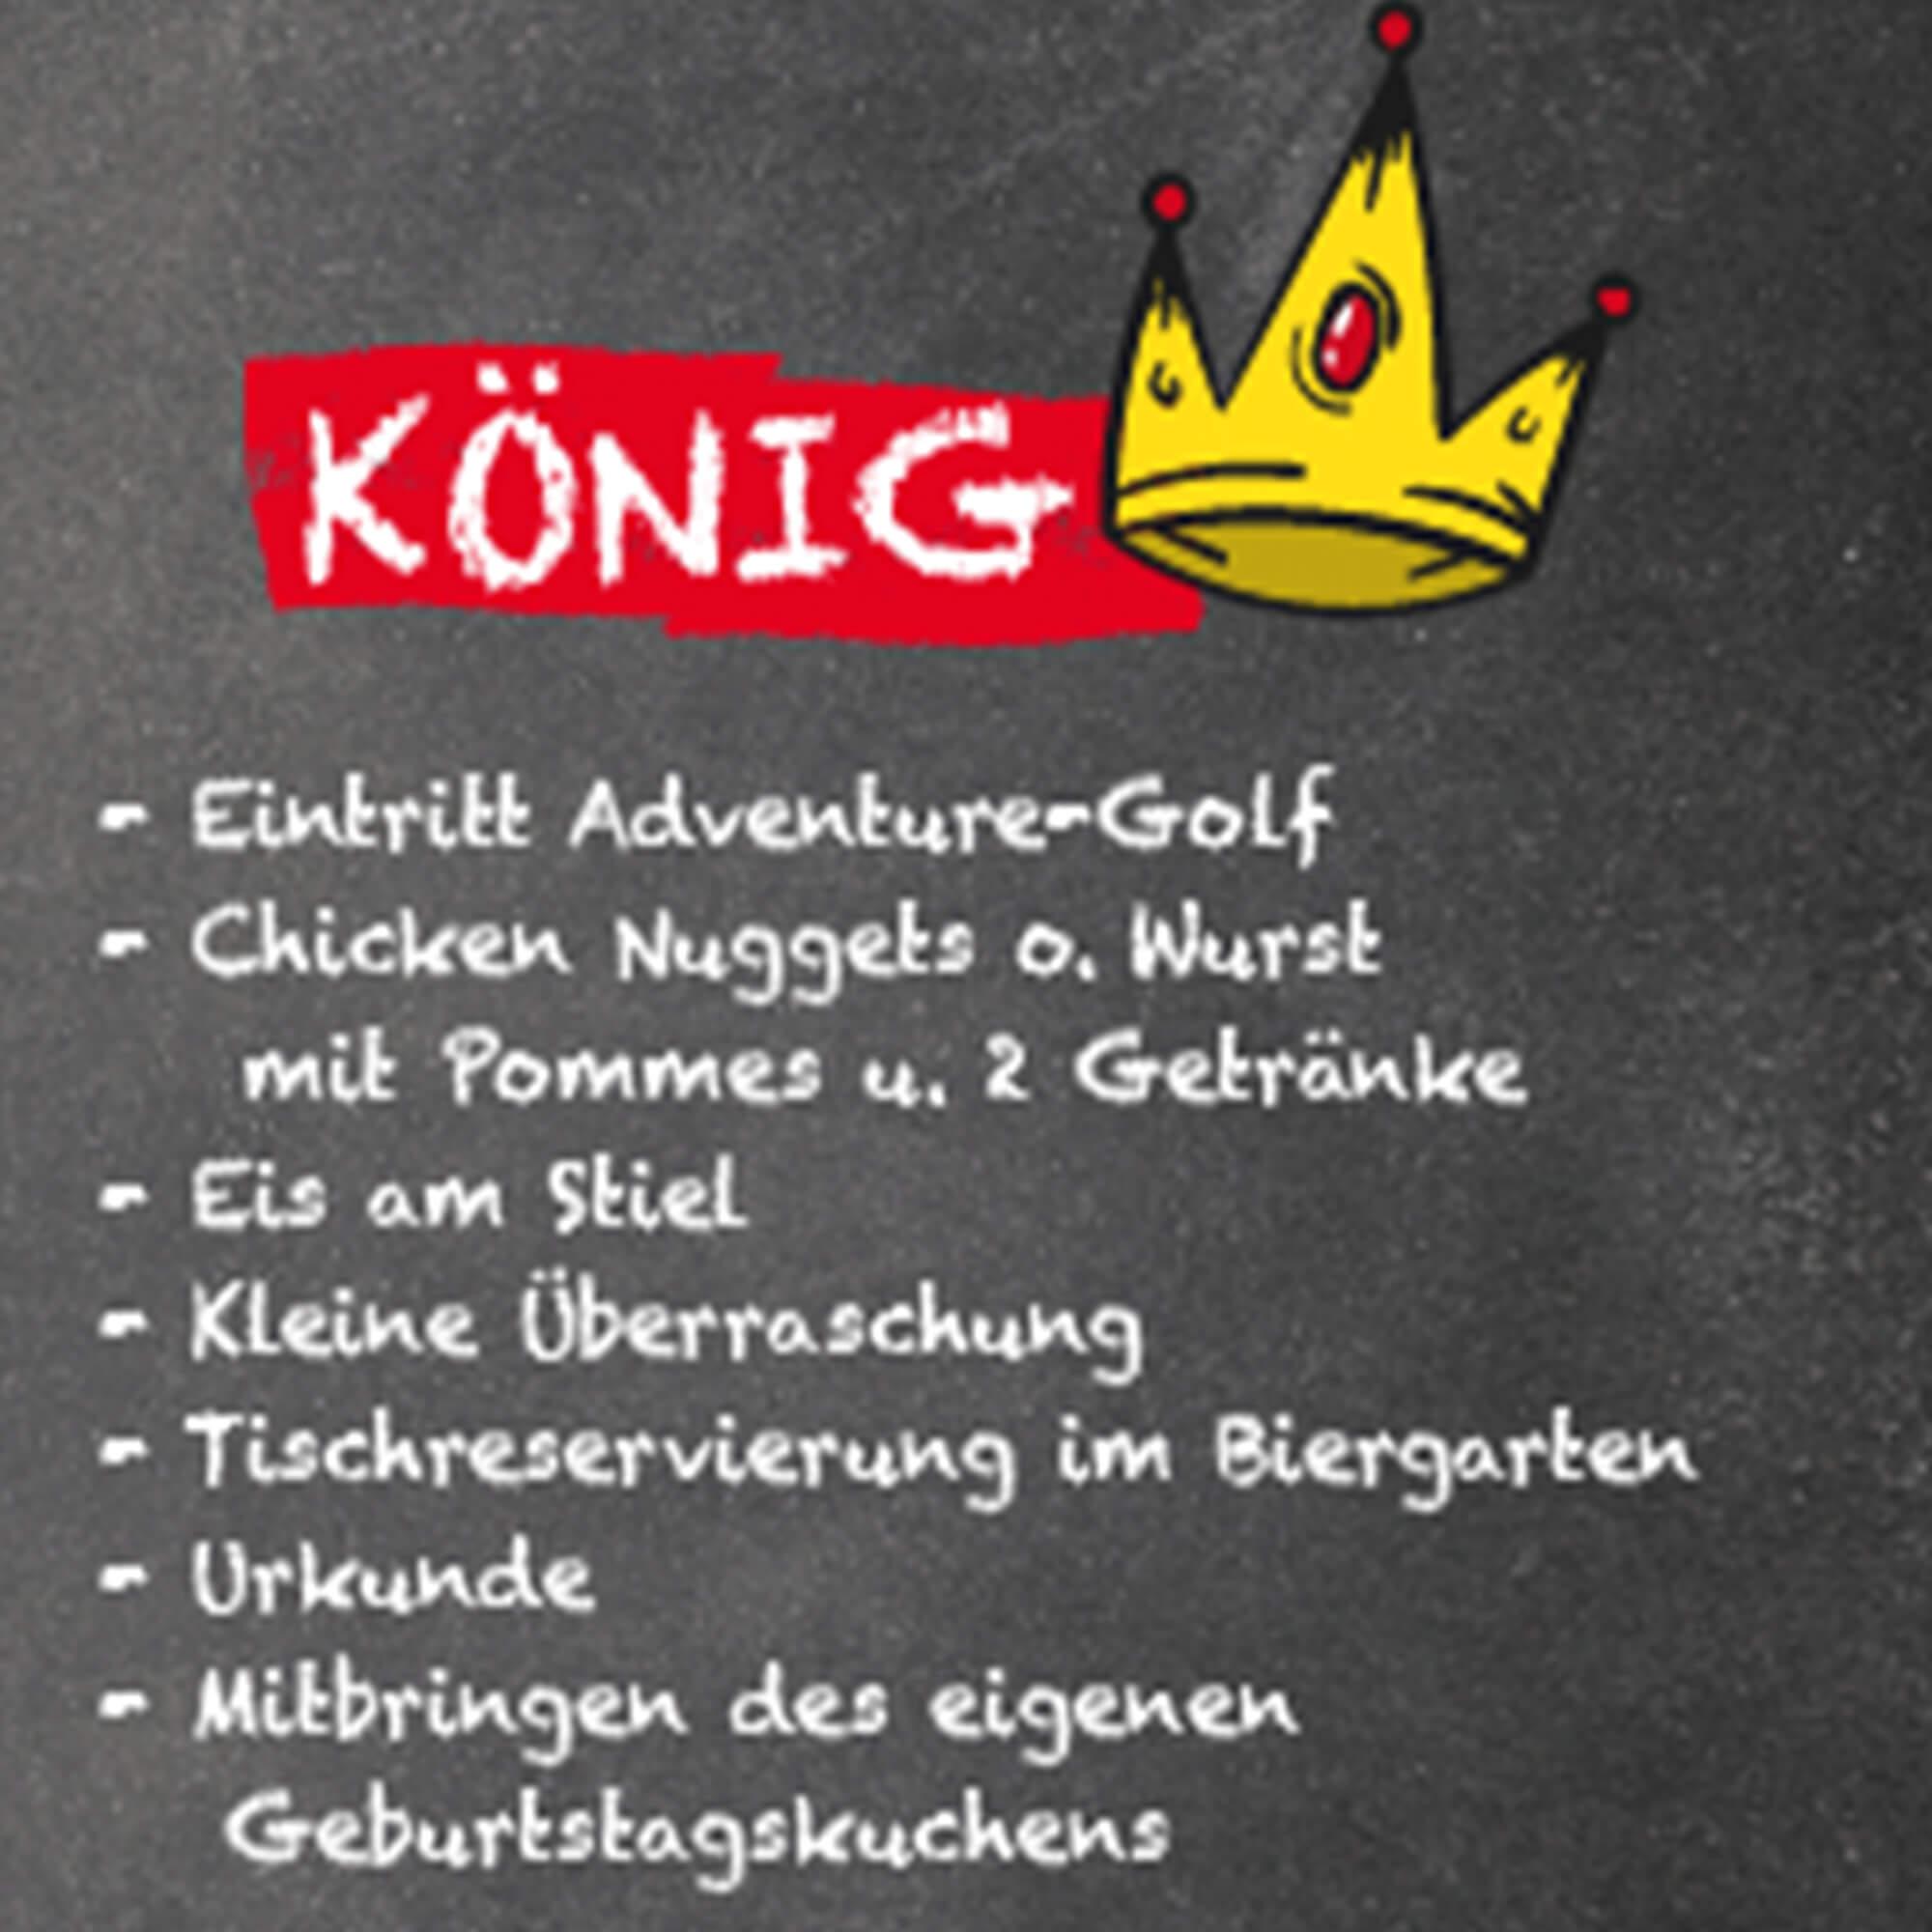 König - Paket